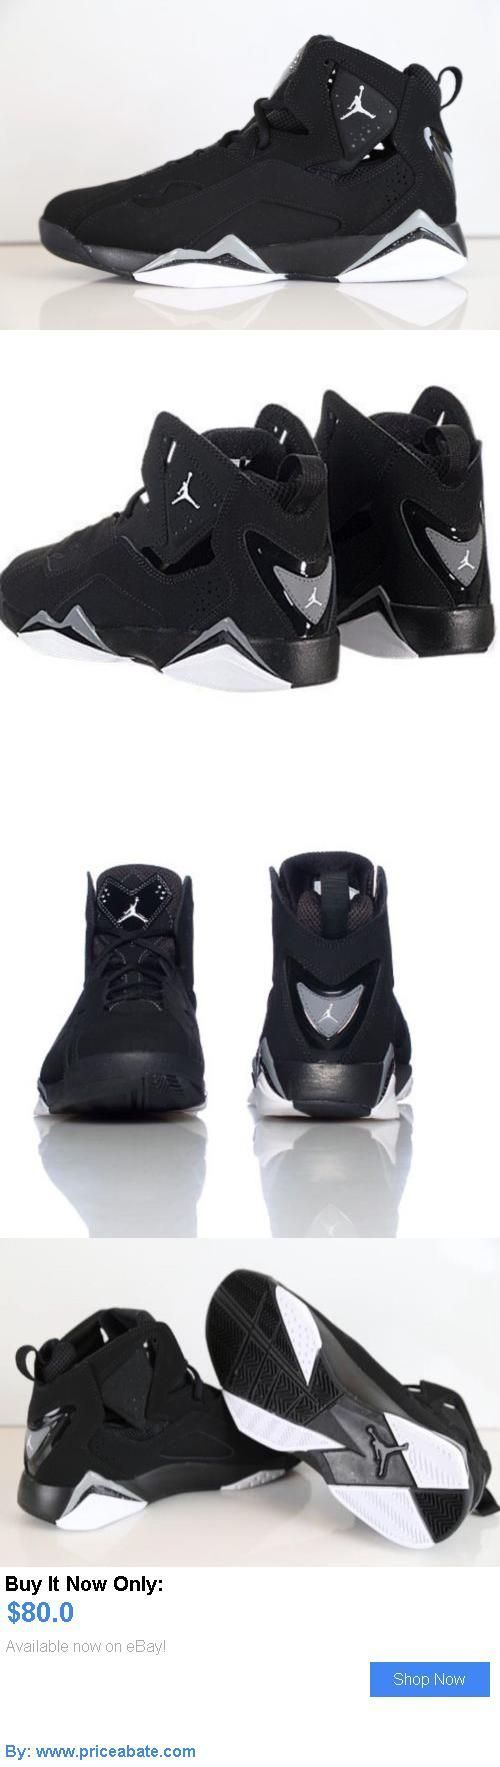 Basketball Nike Air Jordan True Flight Black White Cool Grey Size 11 11 5 Buy It Now Only 80 0 Pricea Jordans Girls Nike Air Jordan Shoes Air Jordan Shoes